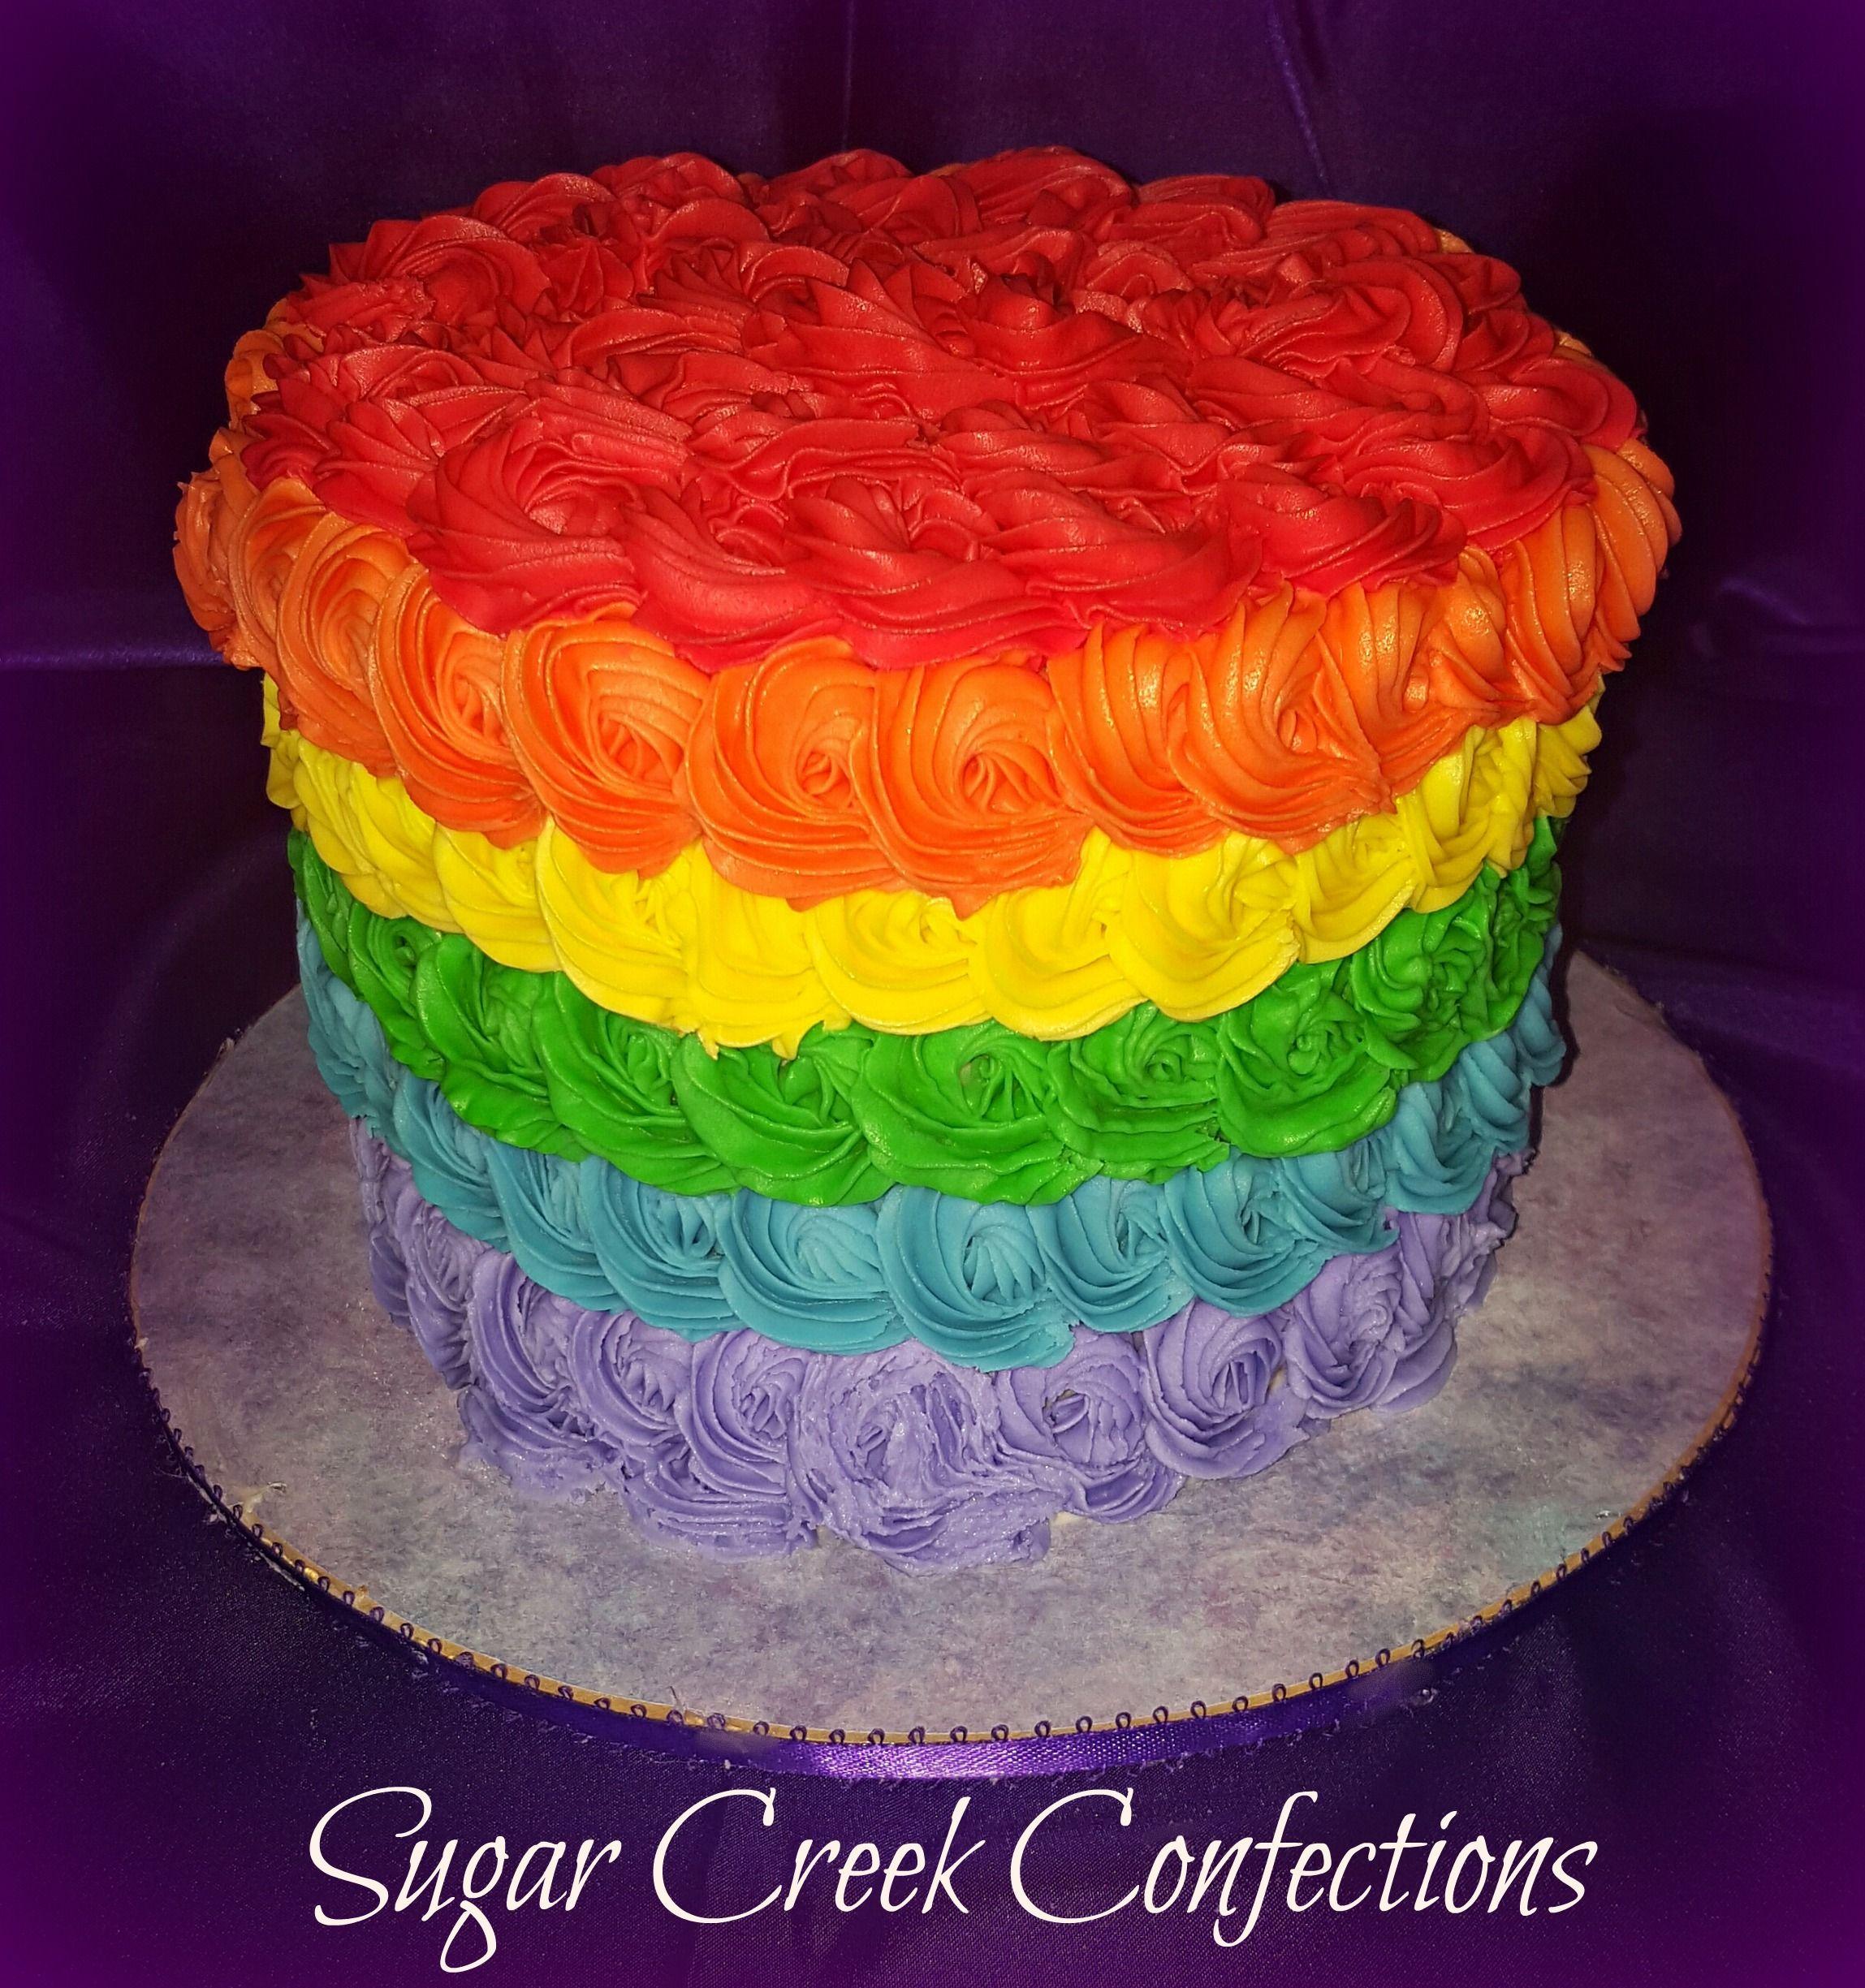 Rainbow Smash Cake - rosette rainbow smash cake